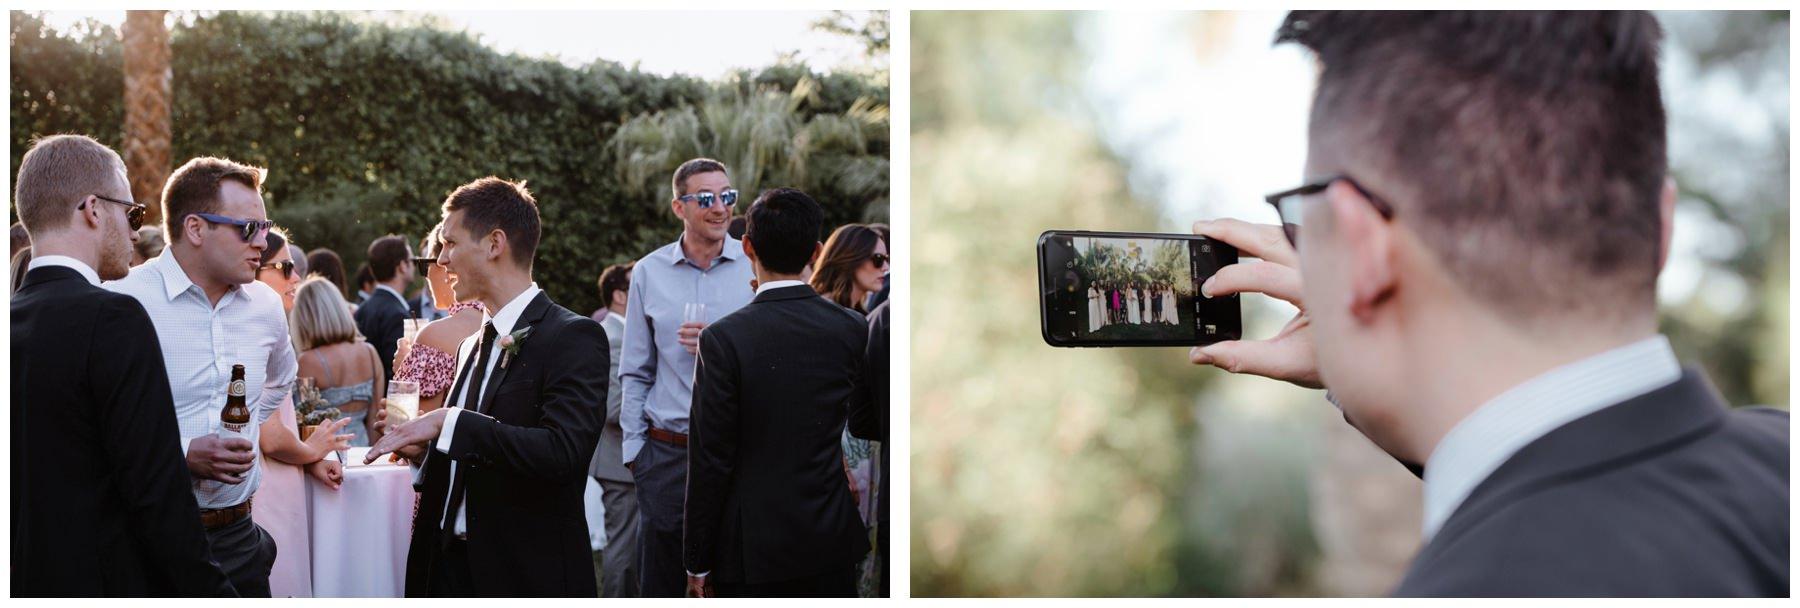 Parker_Palm_Springs_Wedding_0070.jpg